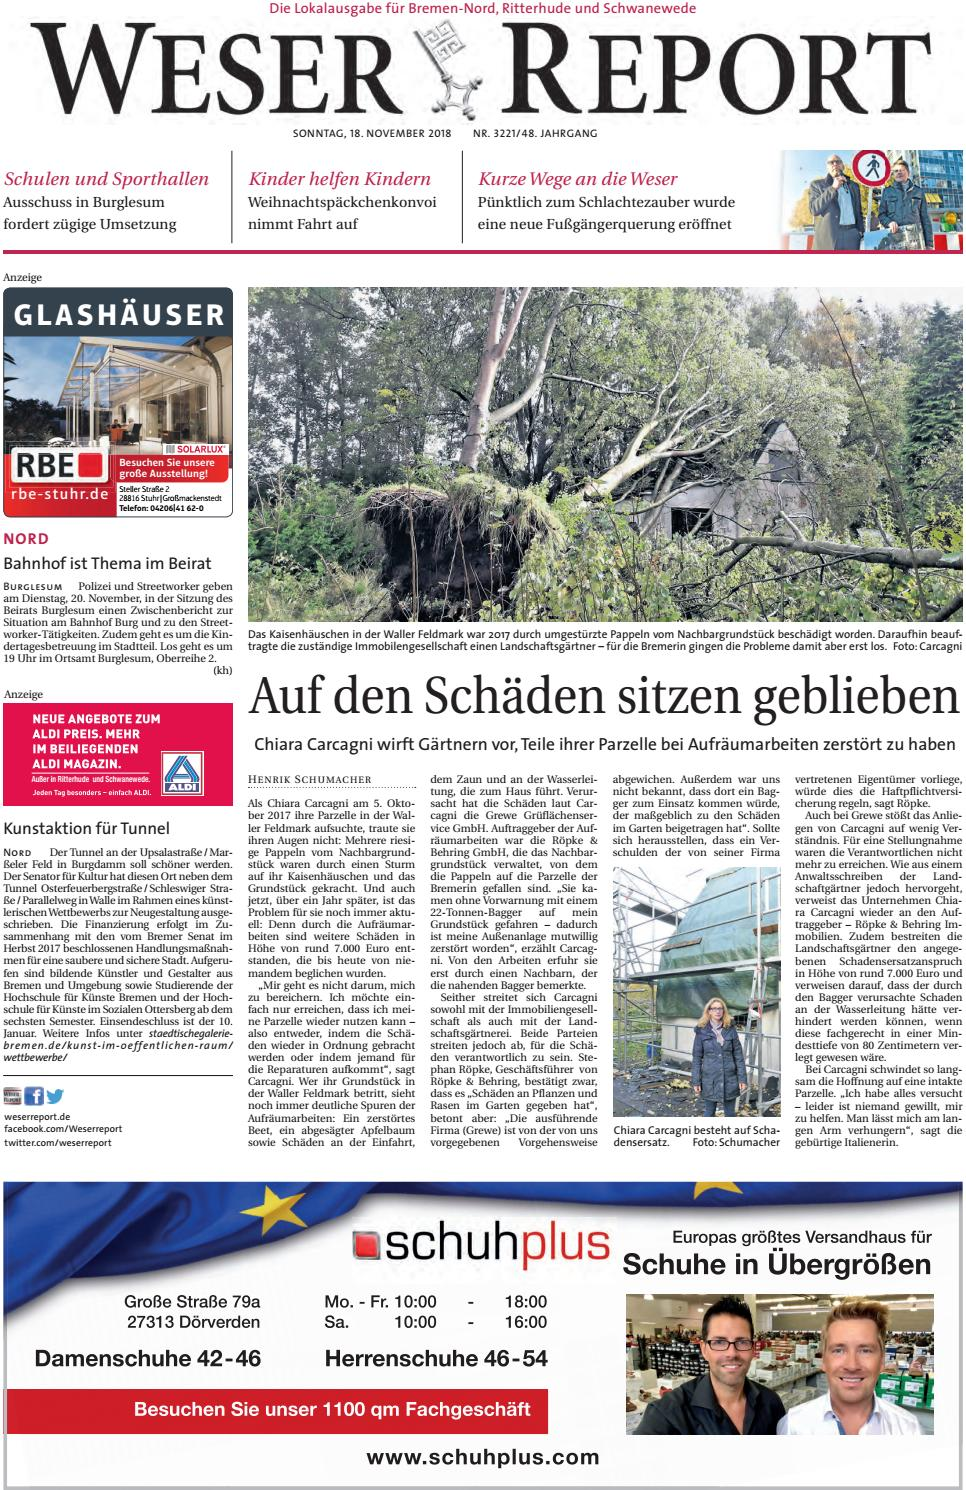 Weser Report - Nord vom 18.11.2018 by KPS Verlagsgesellschaft mbH ...